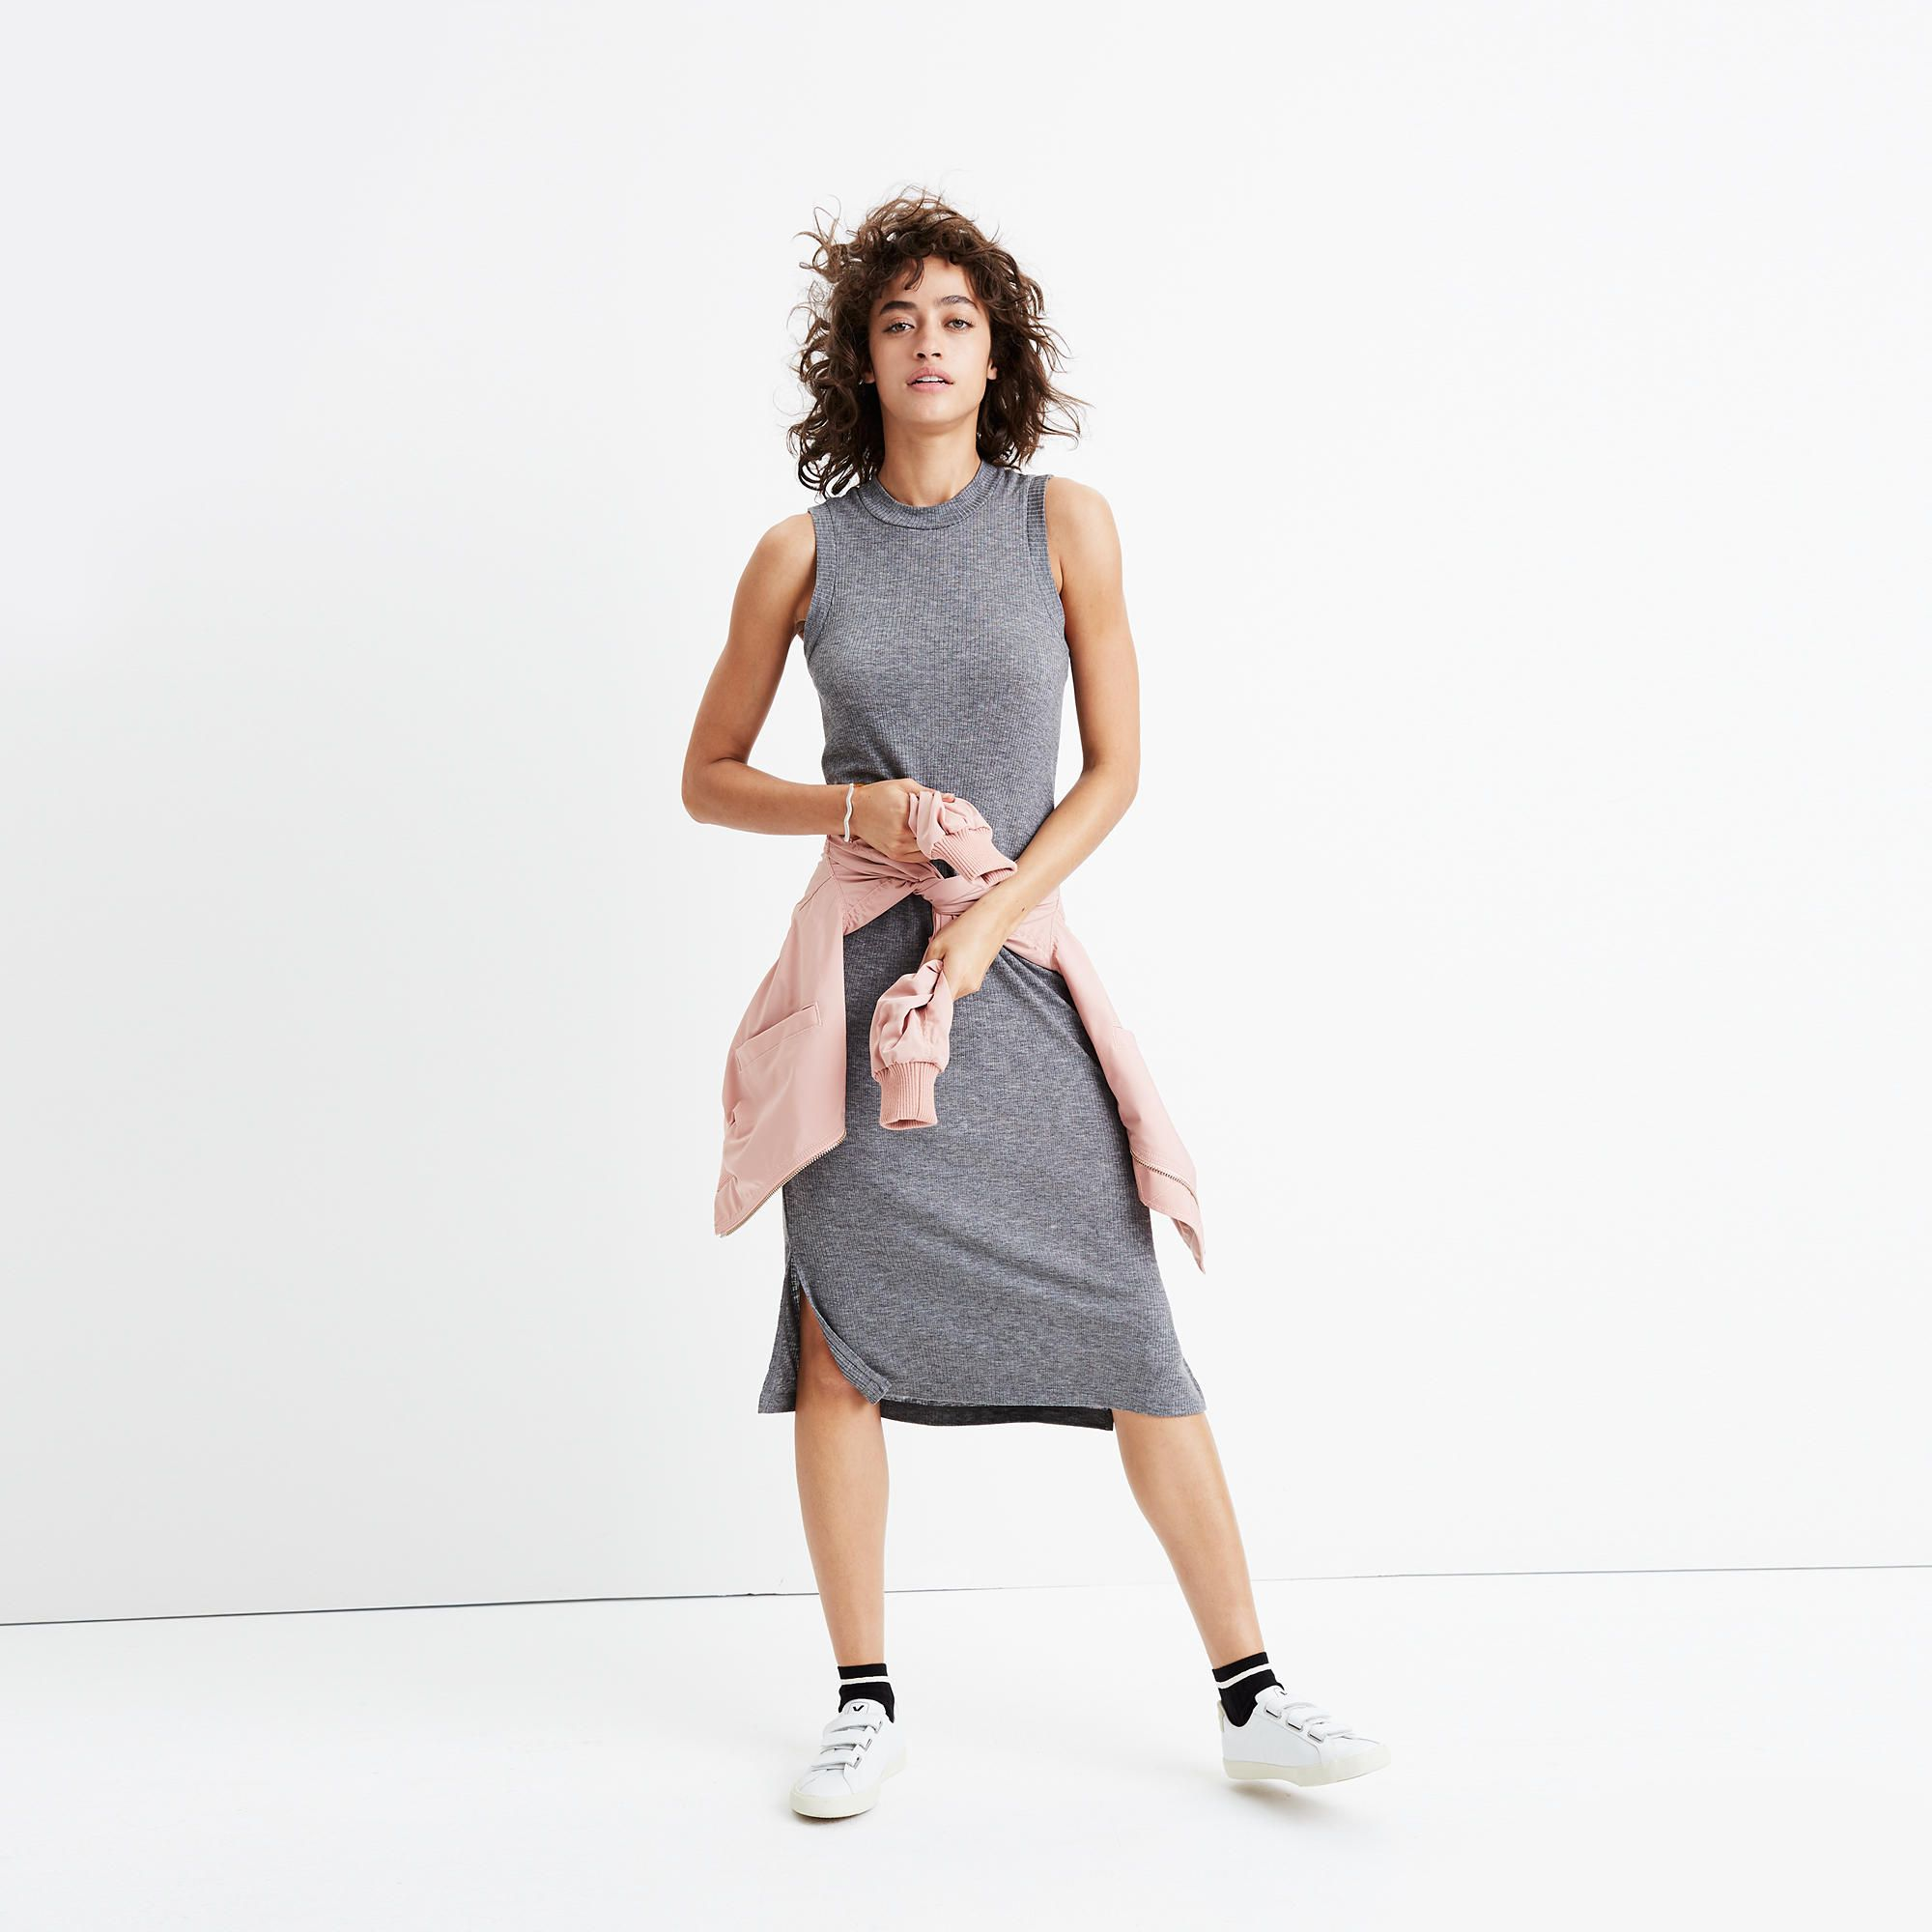 Madewell Ribbed Mockneck Midi Dress Womens Dresses Dresses Sleek Outfit [ 2000 x 2000 Pixel ]